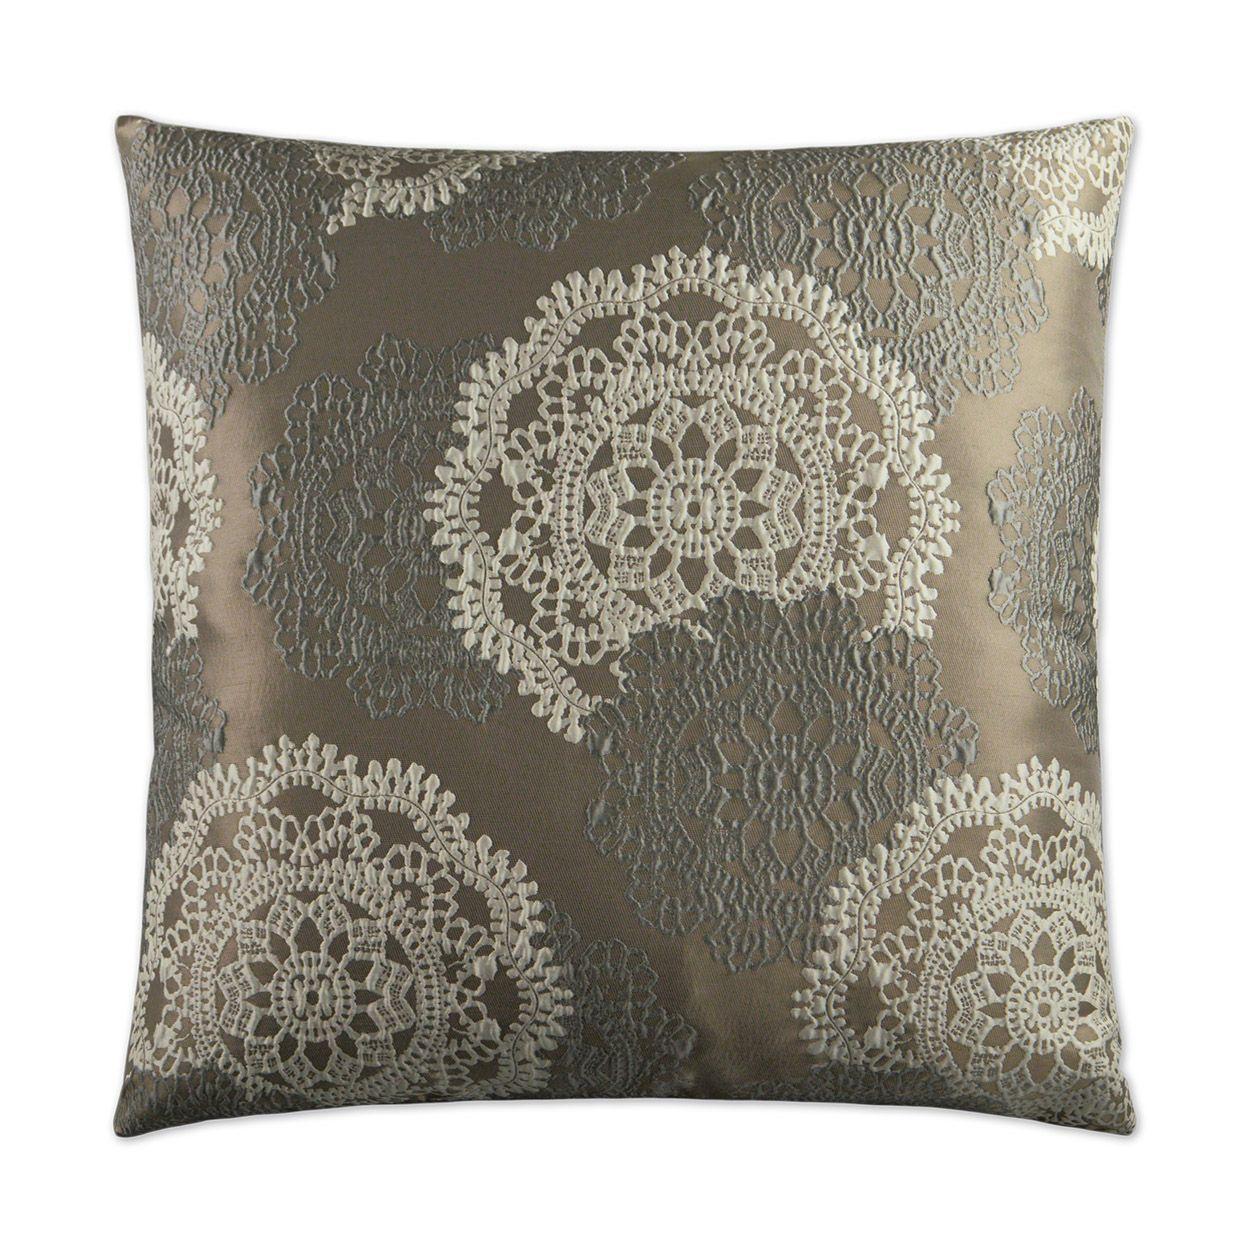 Big lace pillows pinterest